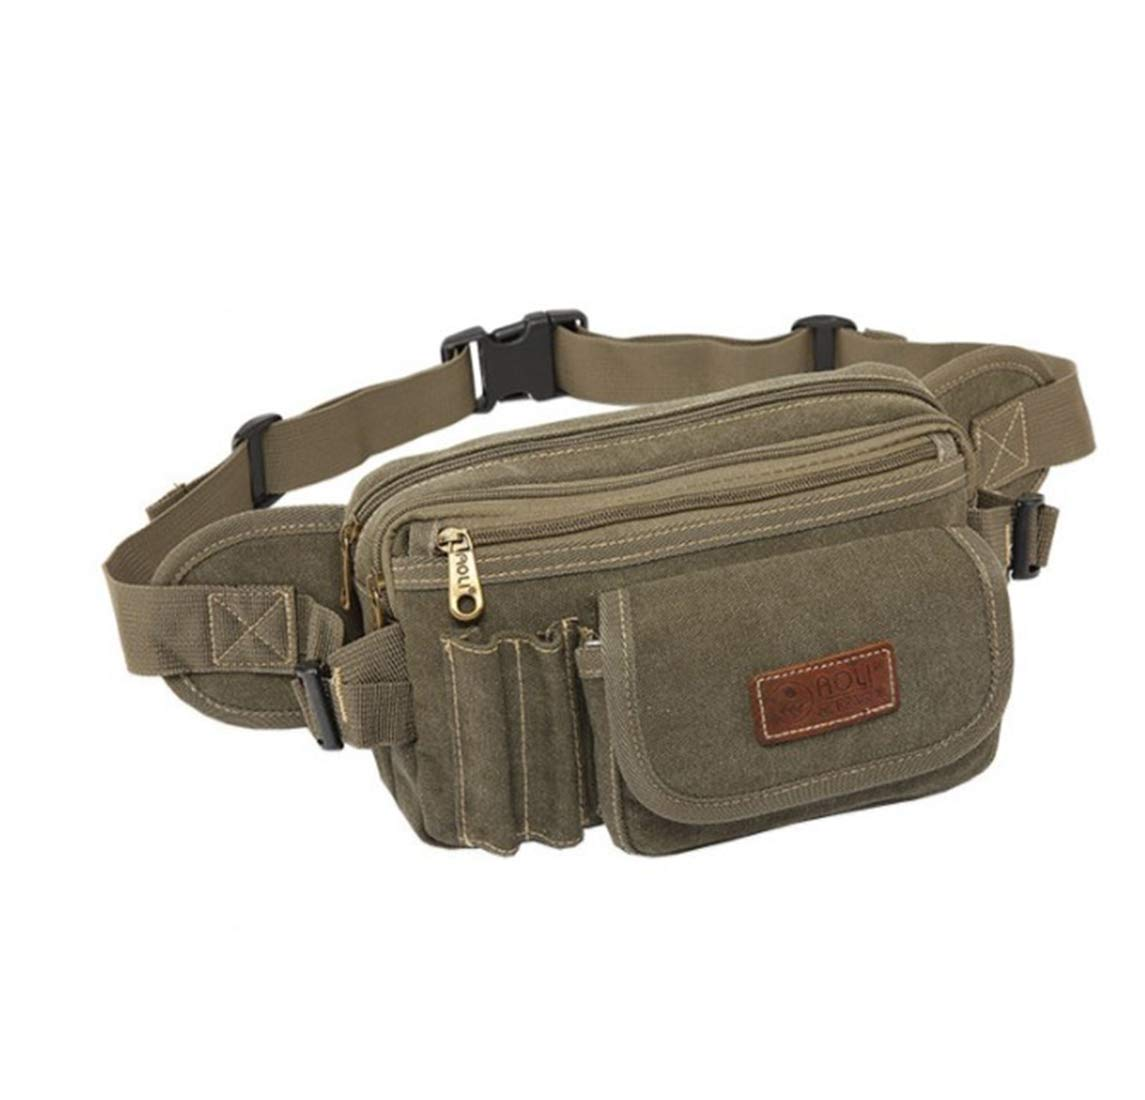 Color : ArmyGreen RABILTY Belt Holster Bag Fanny Waist Pack Crossbody Bag for Men Boy Khaki Canvas Travel Money Belt RFID Blocking